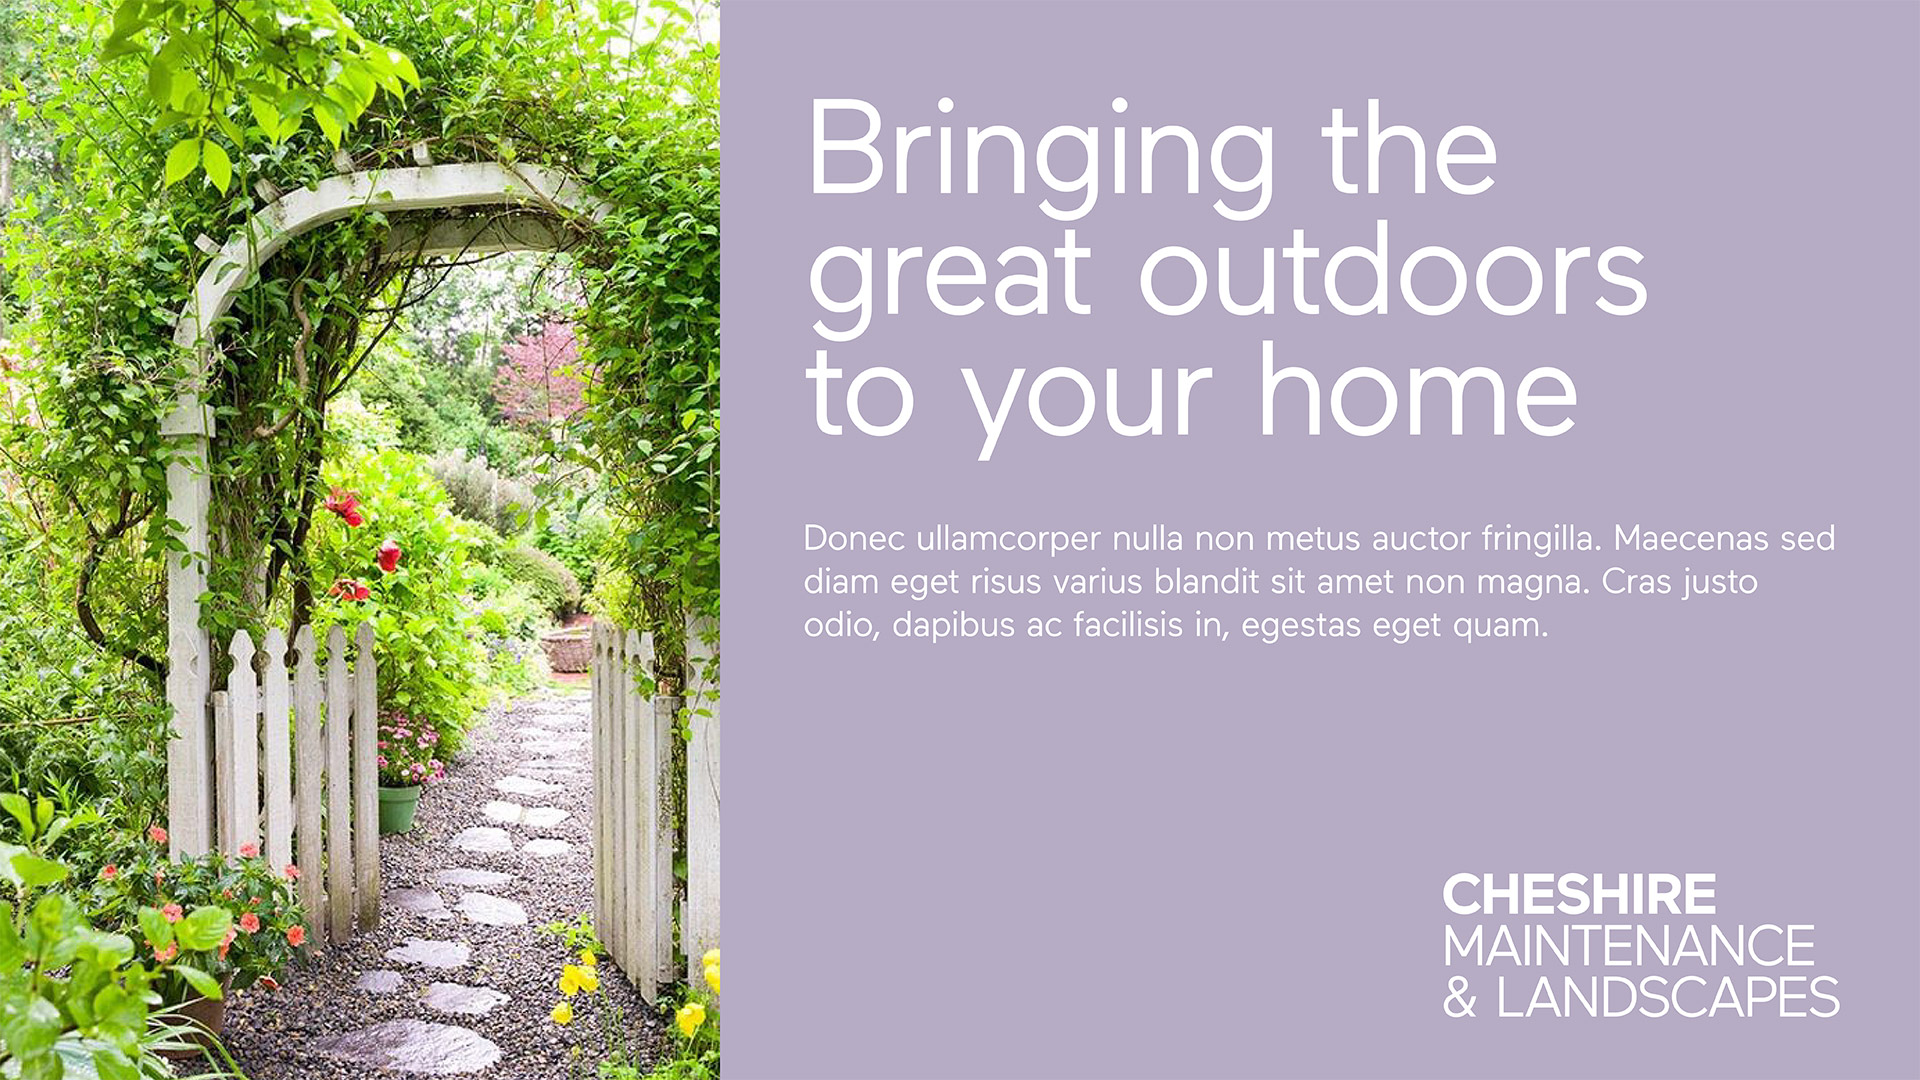 Cheshire Maintenance & Landscapes - Brand Exploration 2